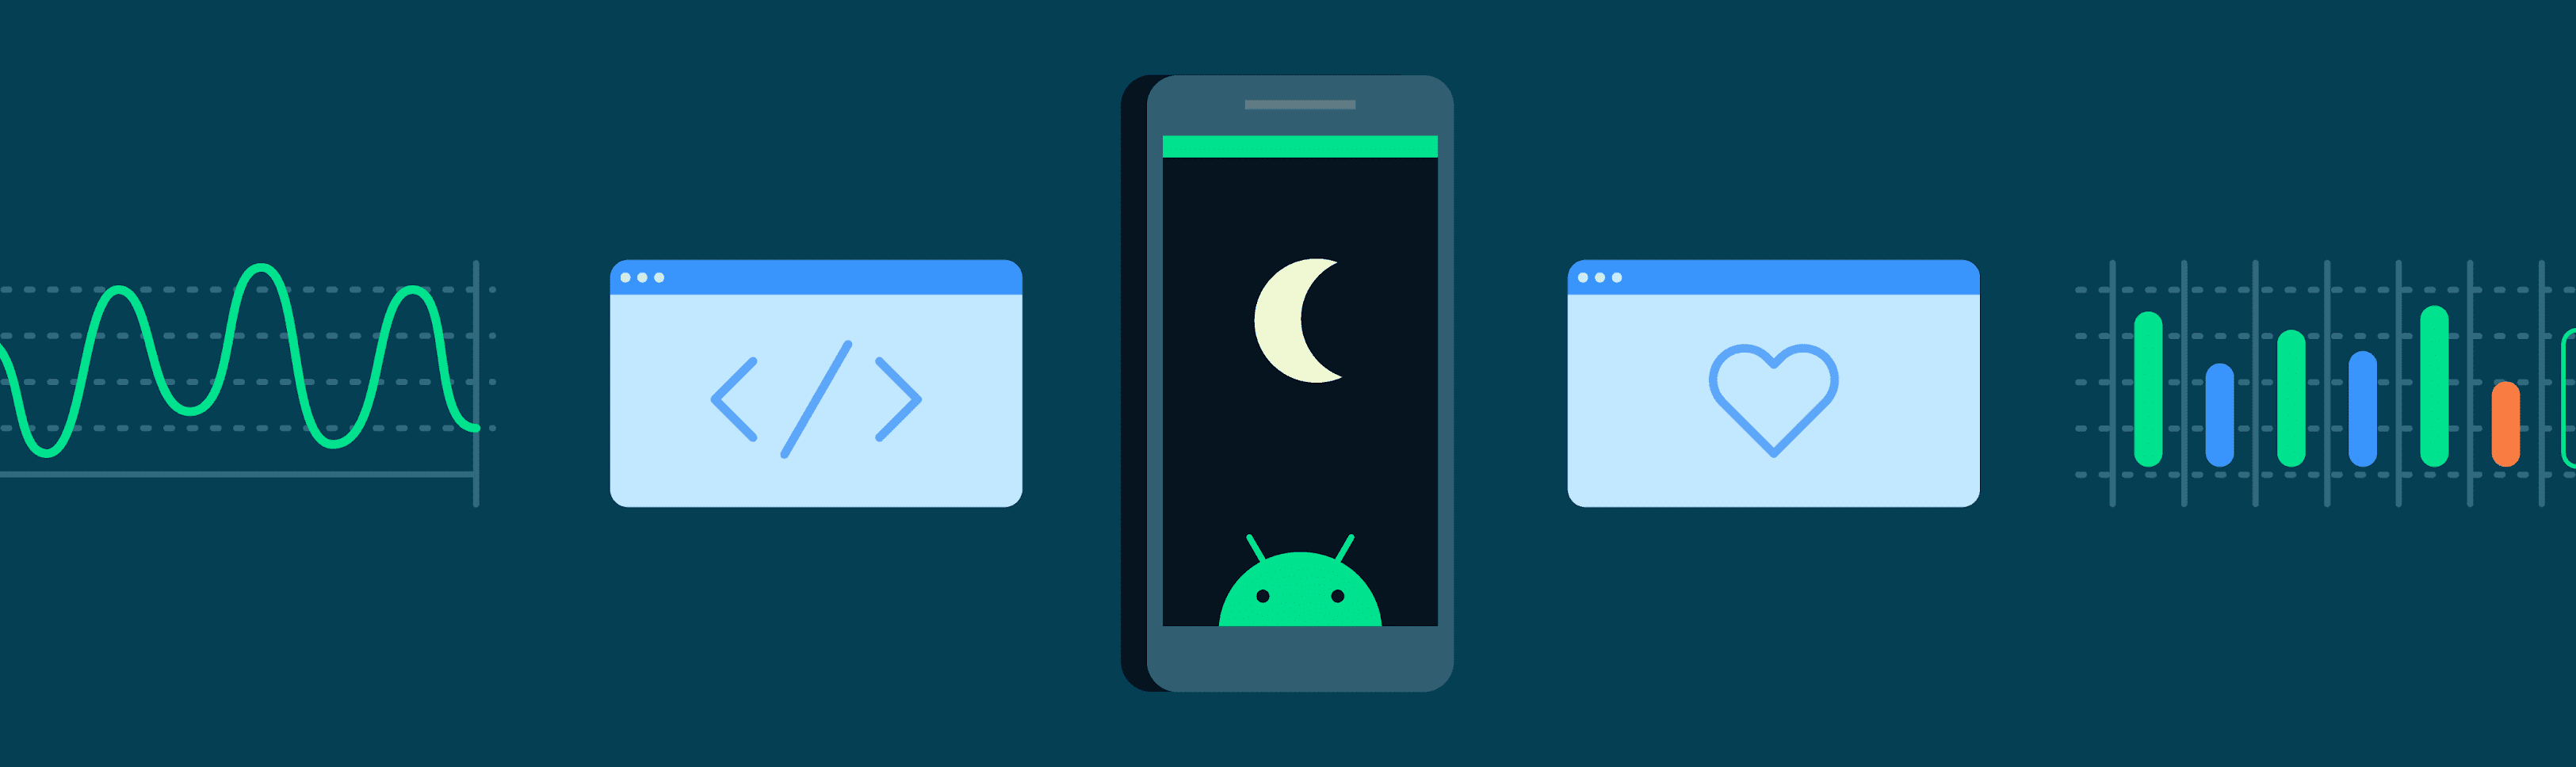 android sleep api